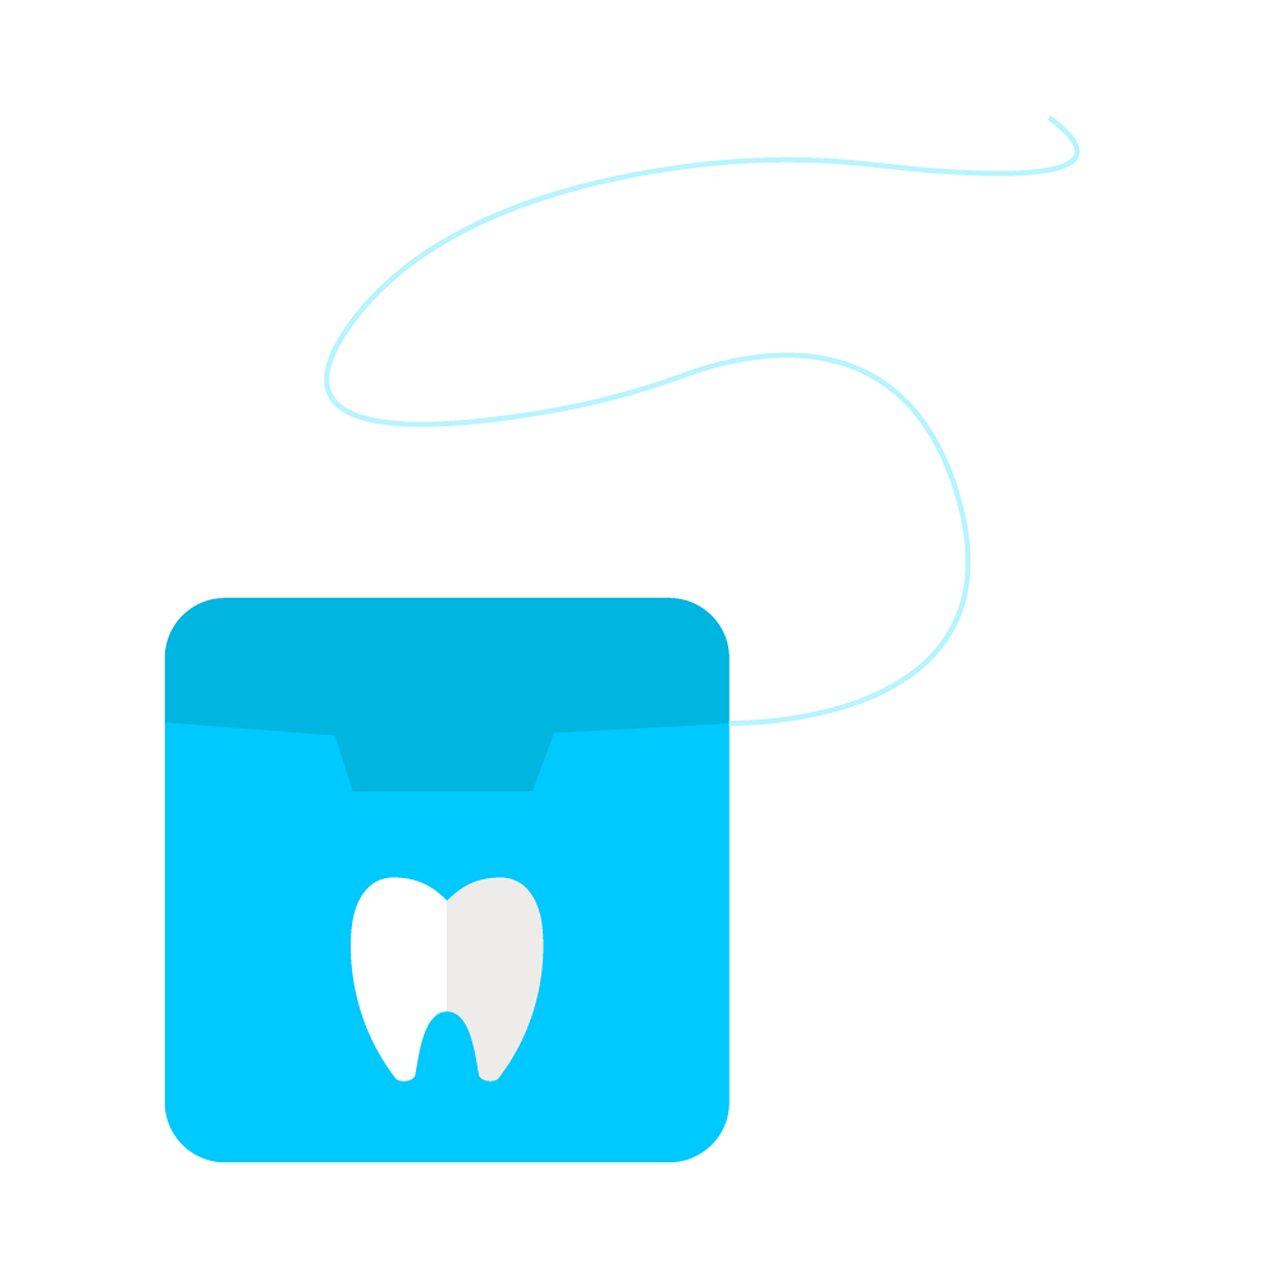 Tonkelaar G angst tandarts